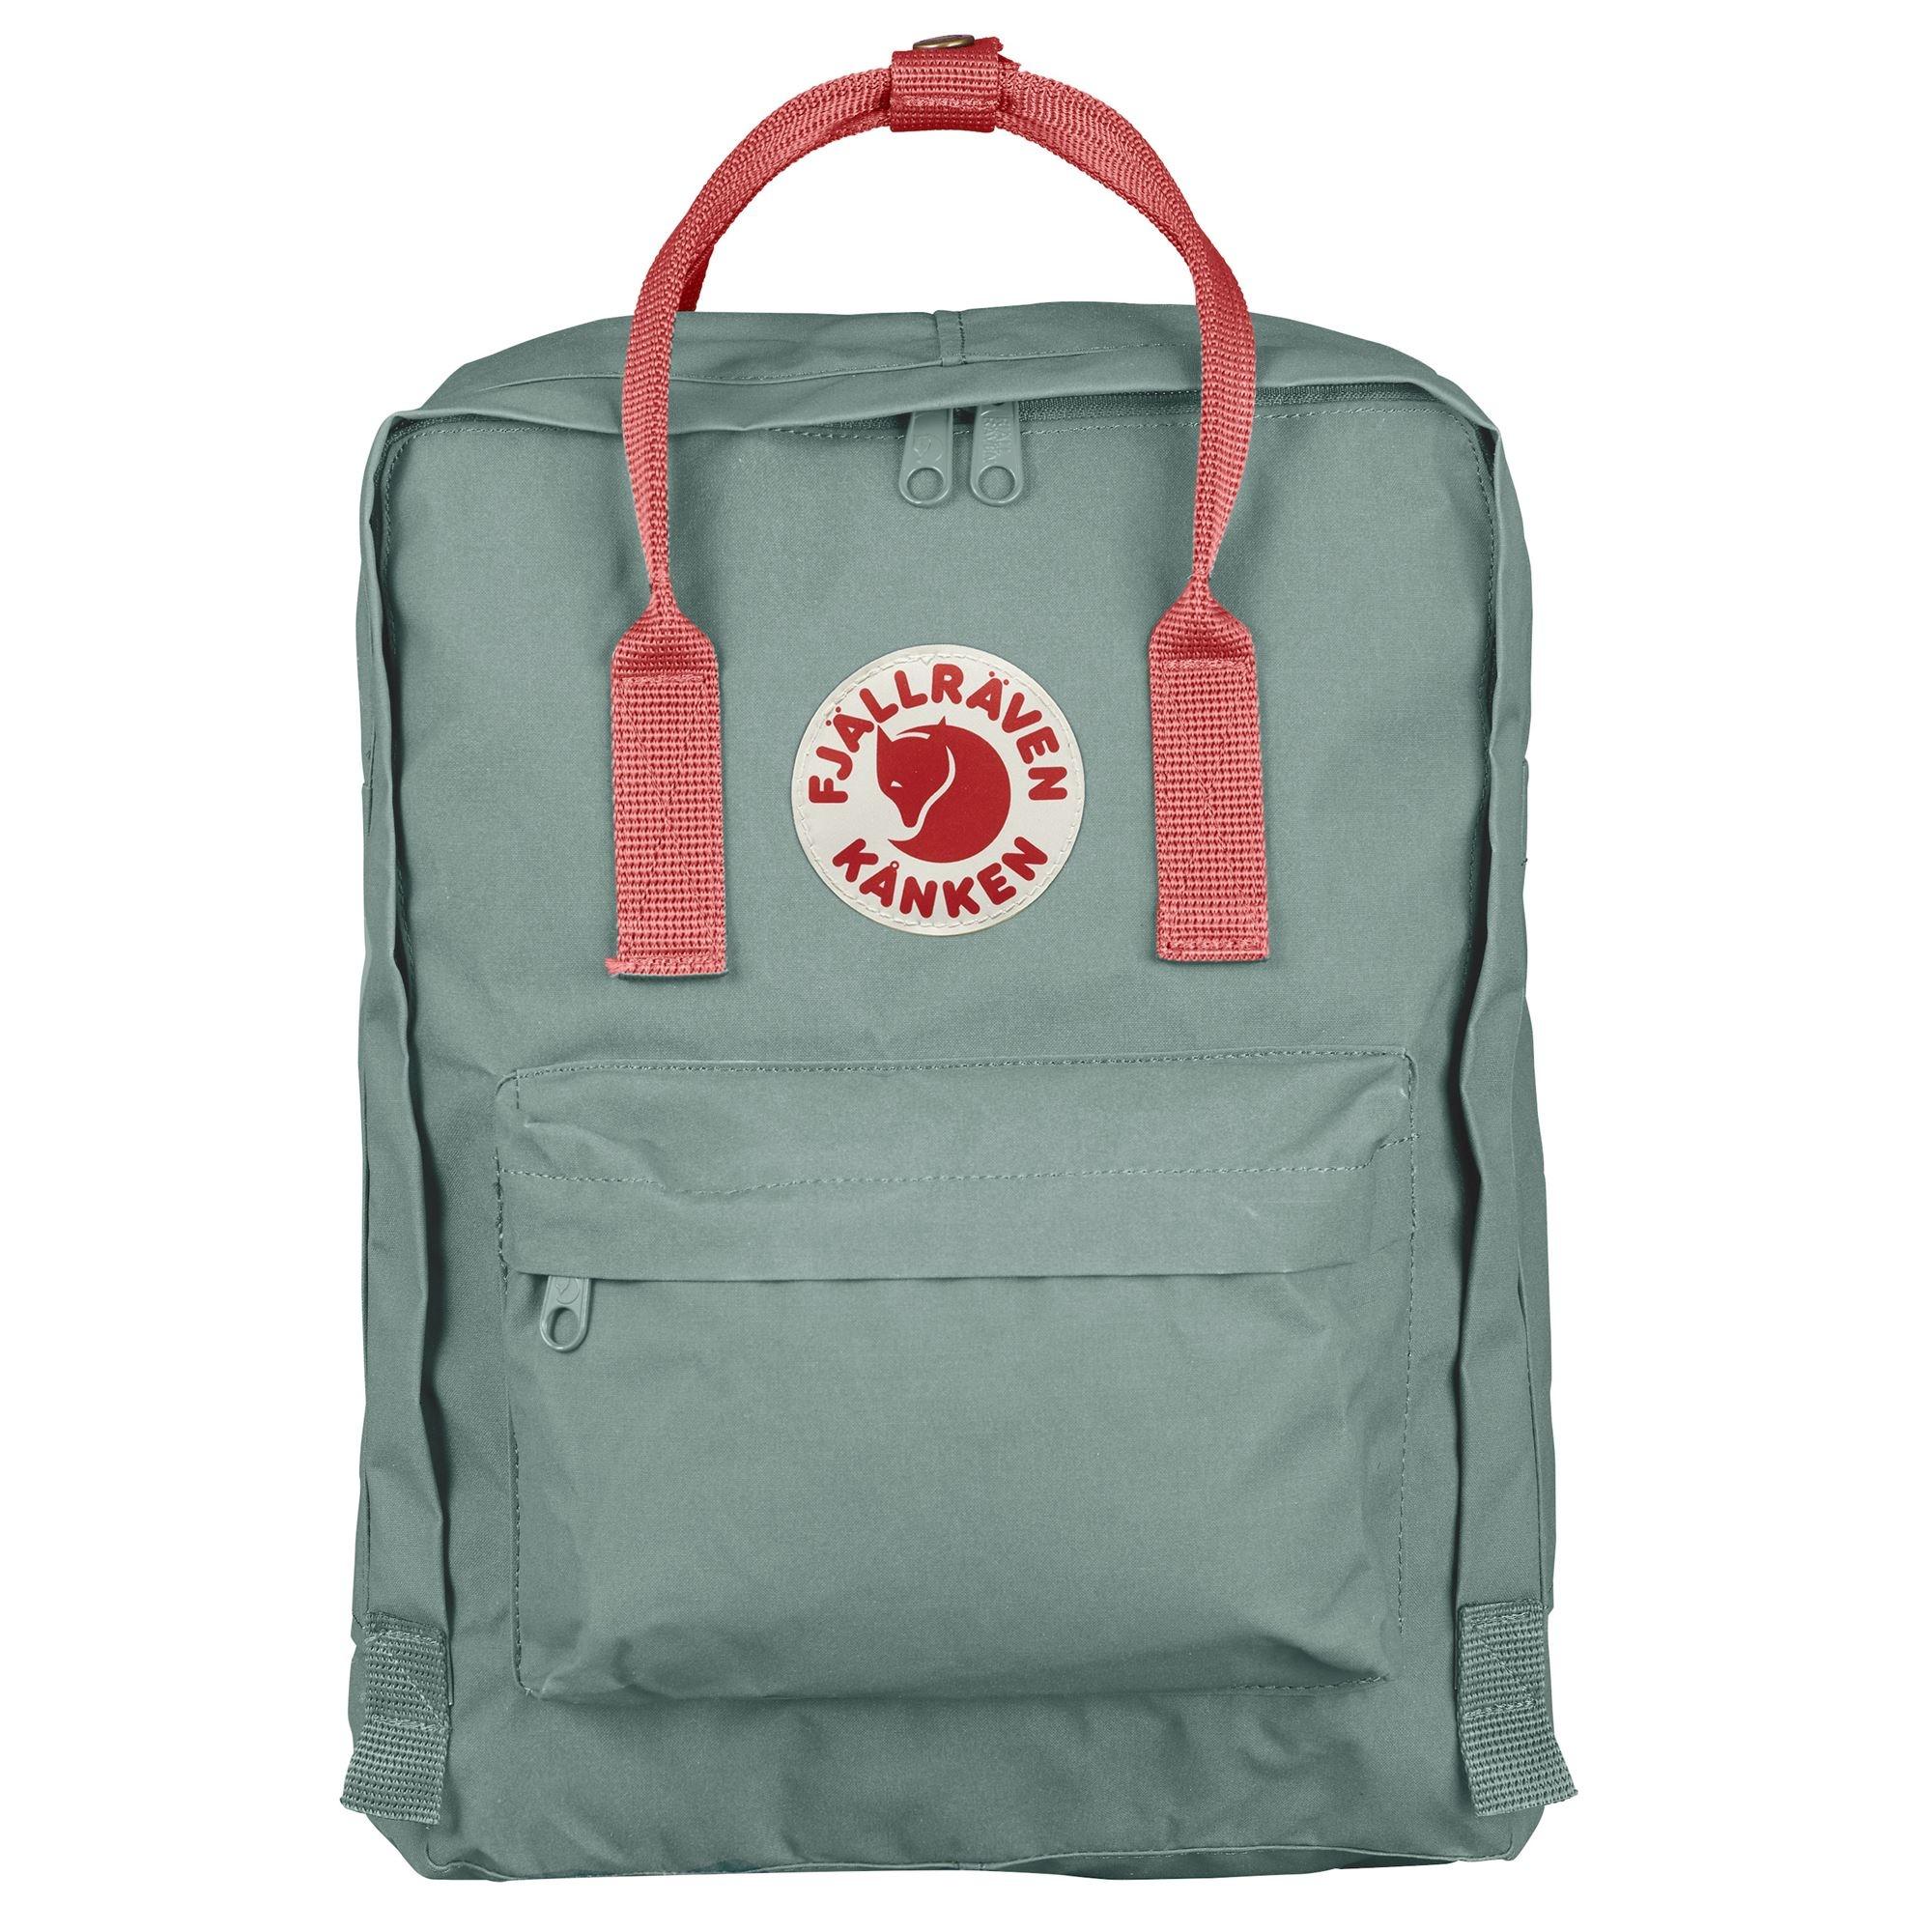 Fjallraven Arctic Fox LLC Fjallraven Kanken Classic Backpack - Frost Green-Peach Pink